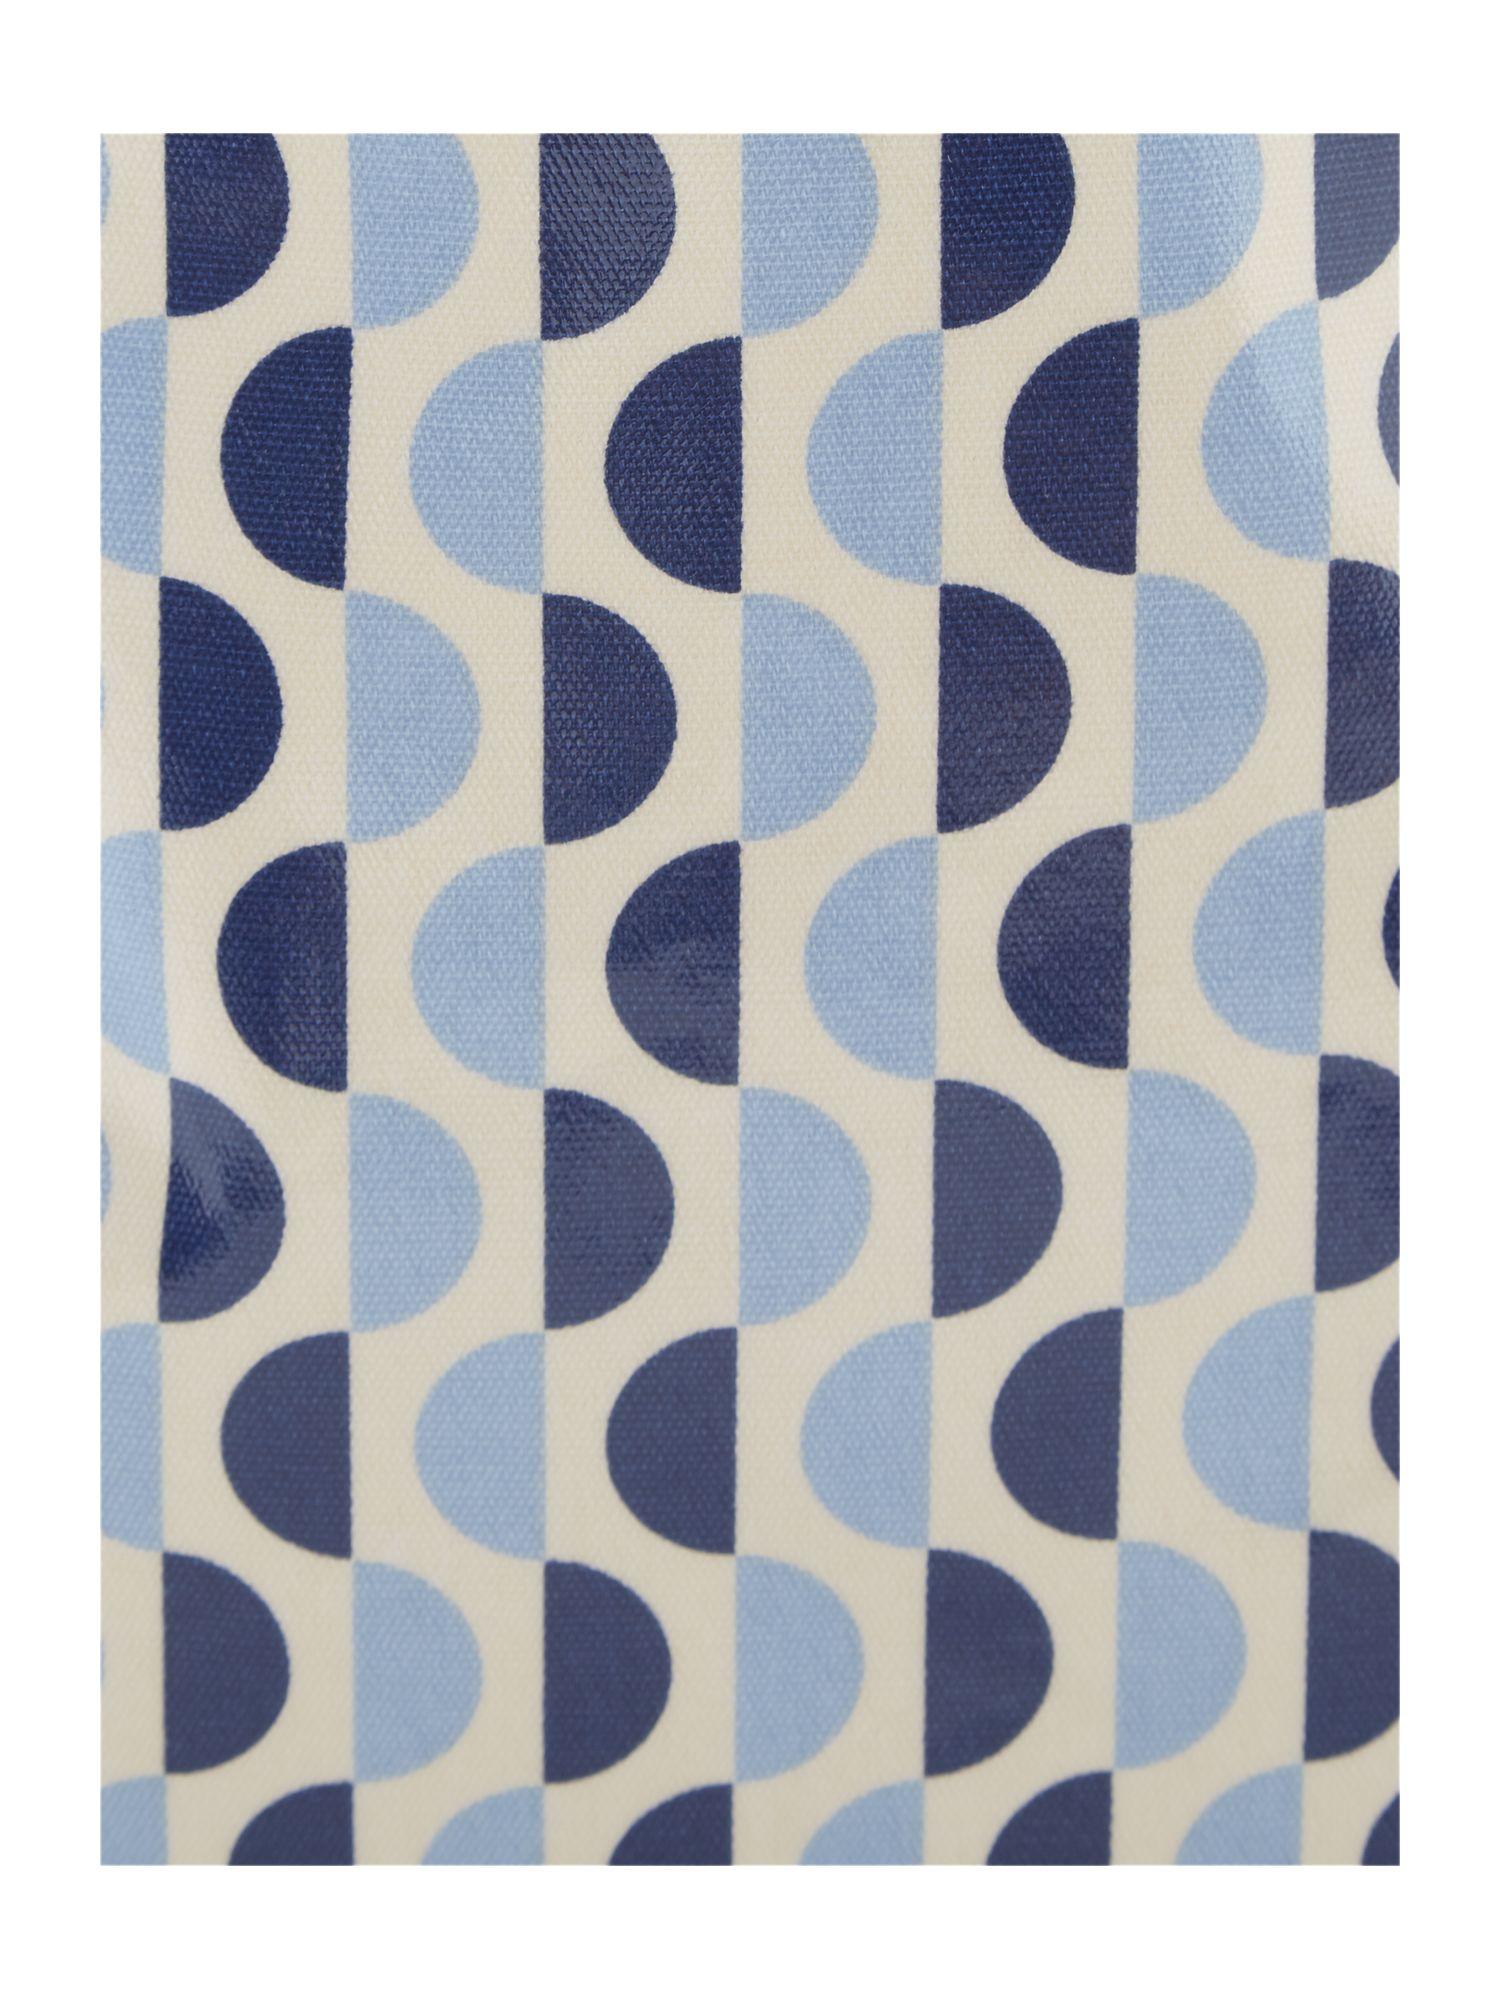 Dickins & Jones Canvas Tote in Blue